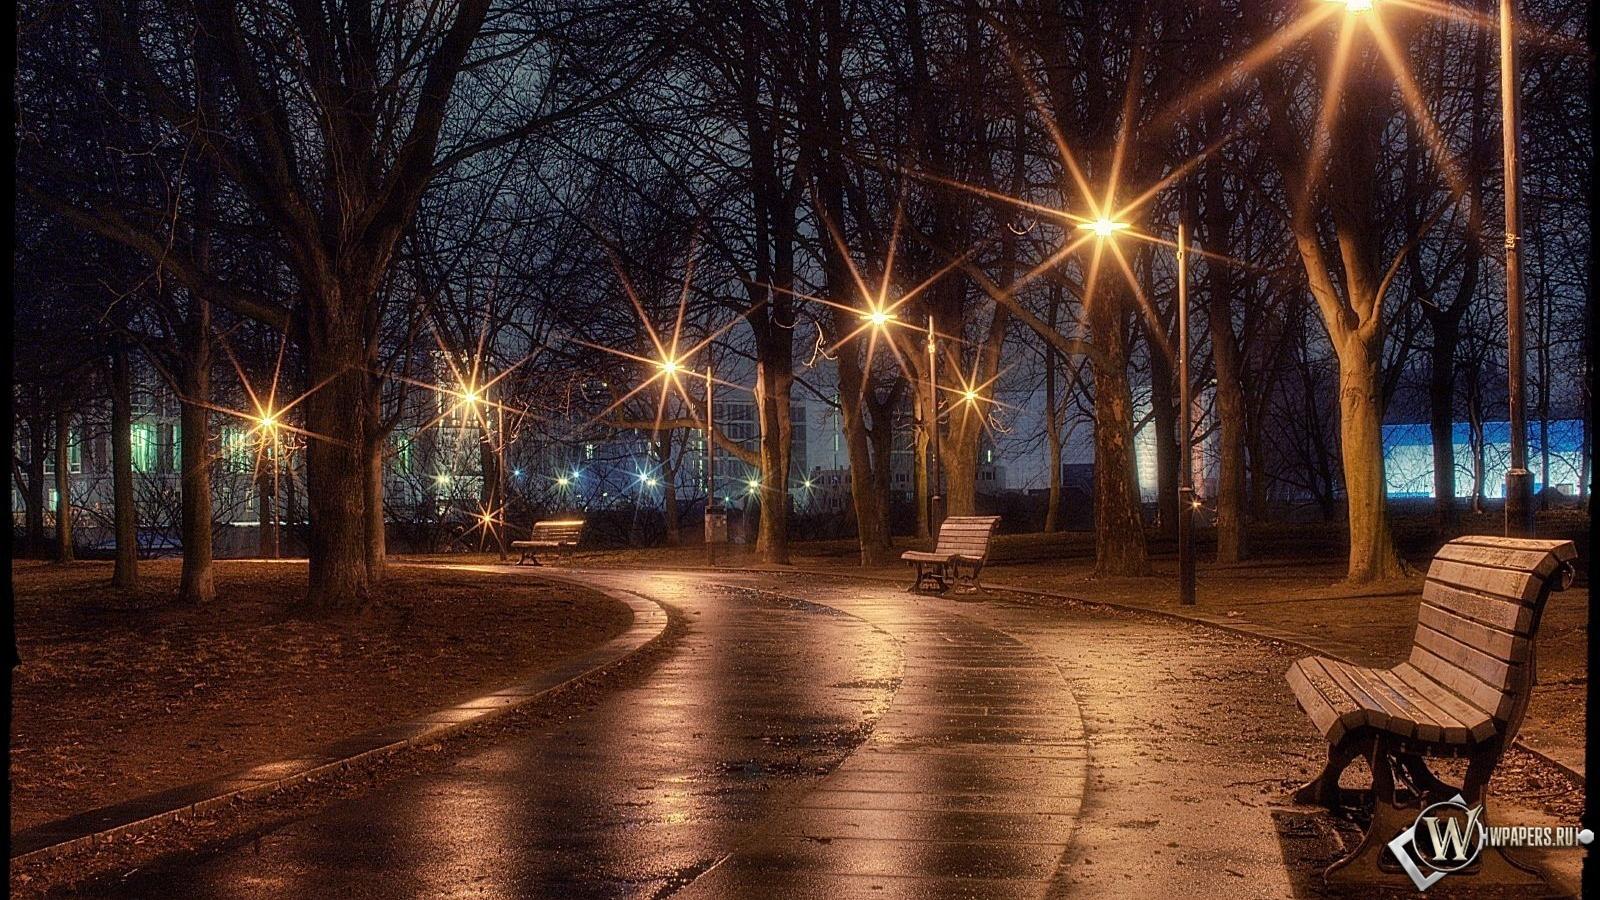 Ночная аллея 1600x900